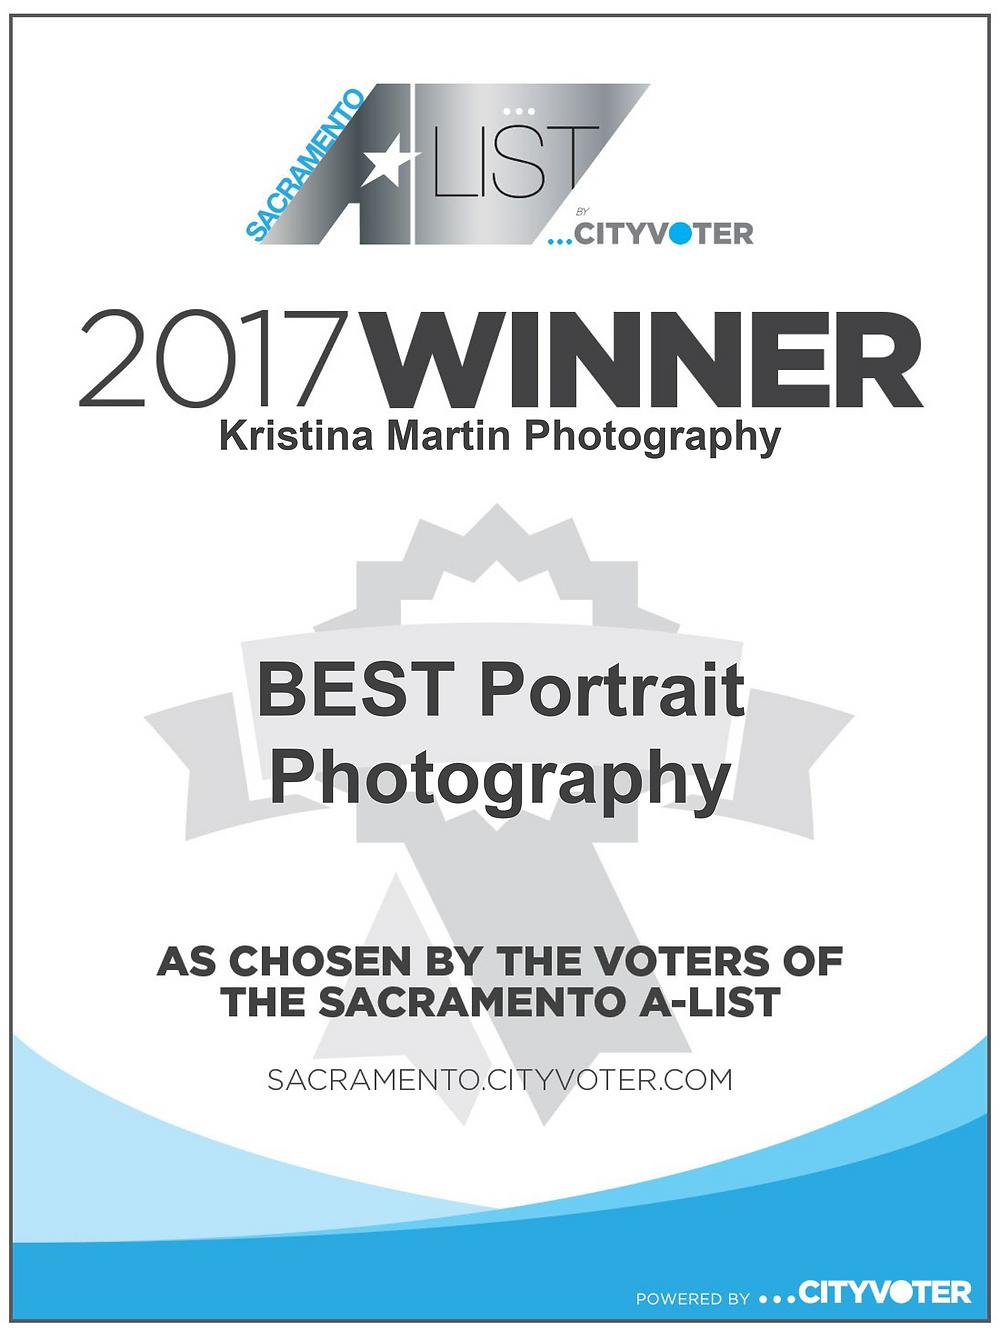 Sacramento outdoor family photography, best family photographer, Sacramento, Roseville, Lincoln, Rocklin, Plumas Lake, Fair Oaks, Granite Bay, Folsom, Antelope, Citrus Heights, Carmichael